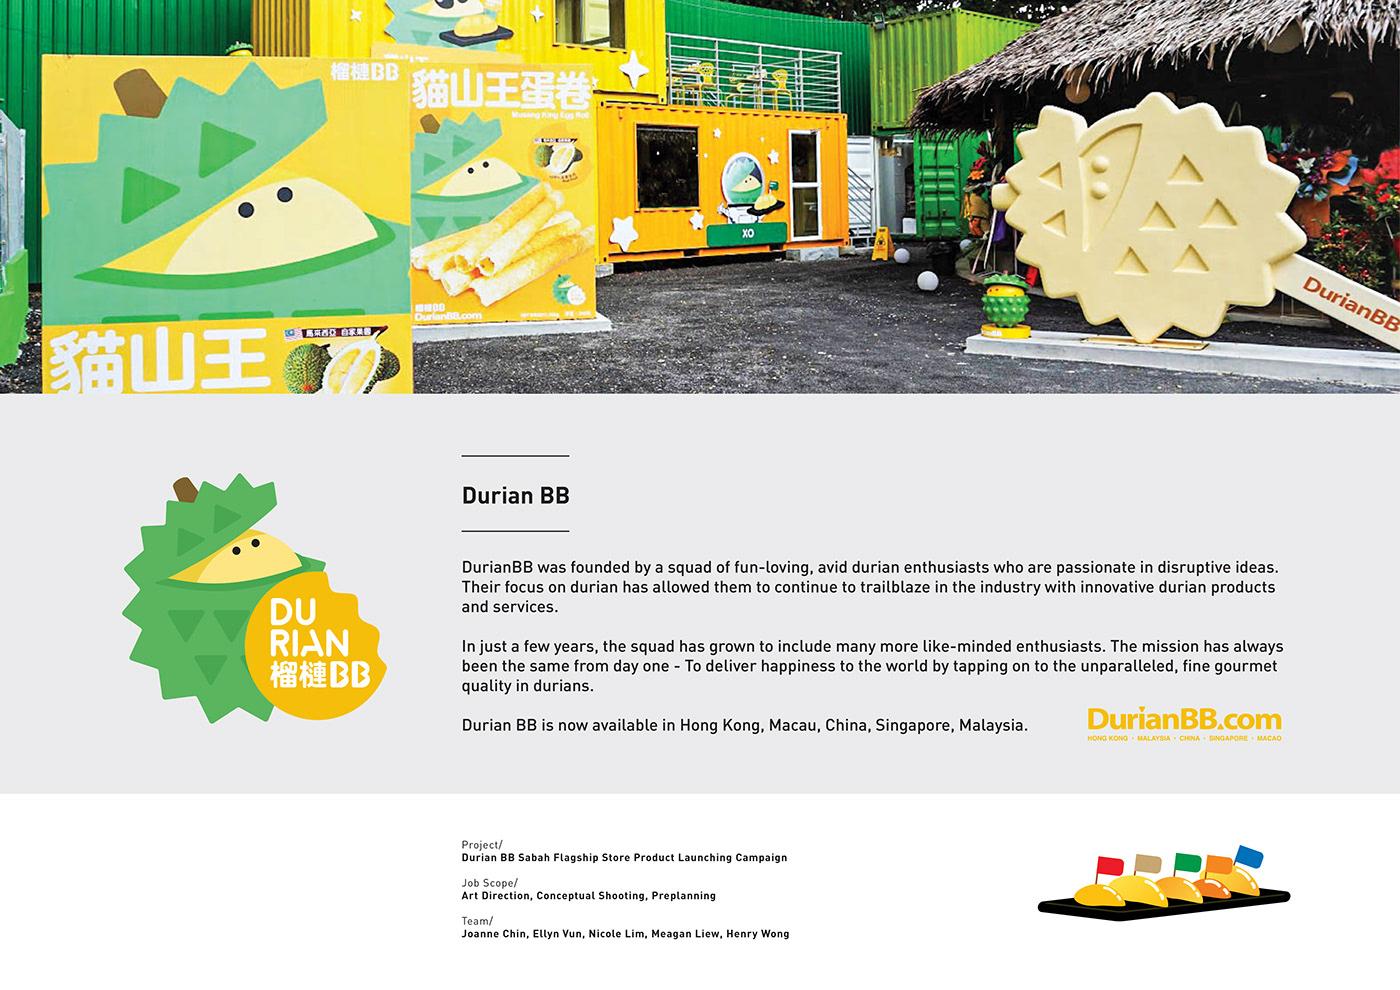 Durian BB Conceptual Shooting on Behance